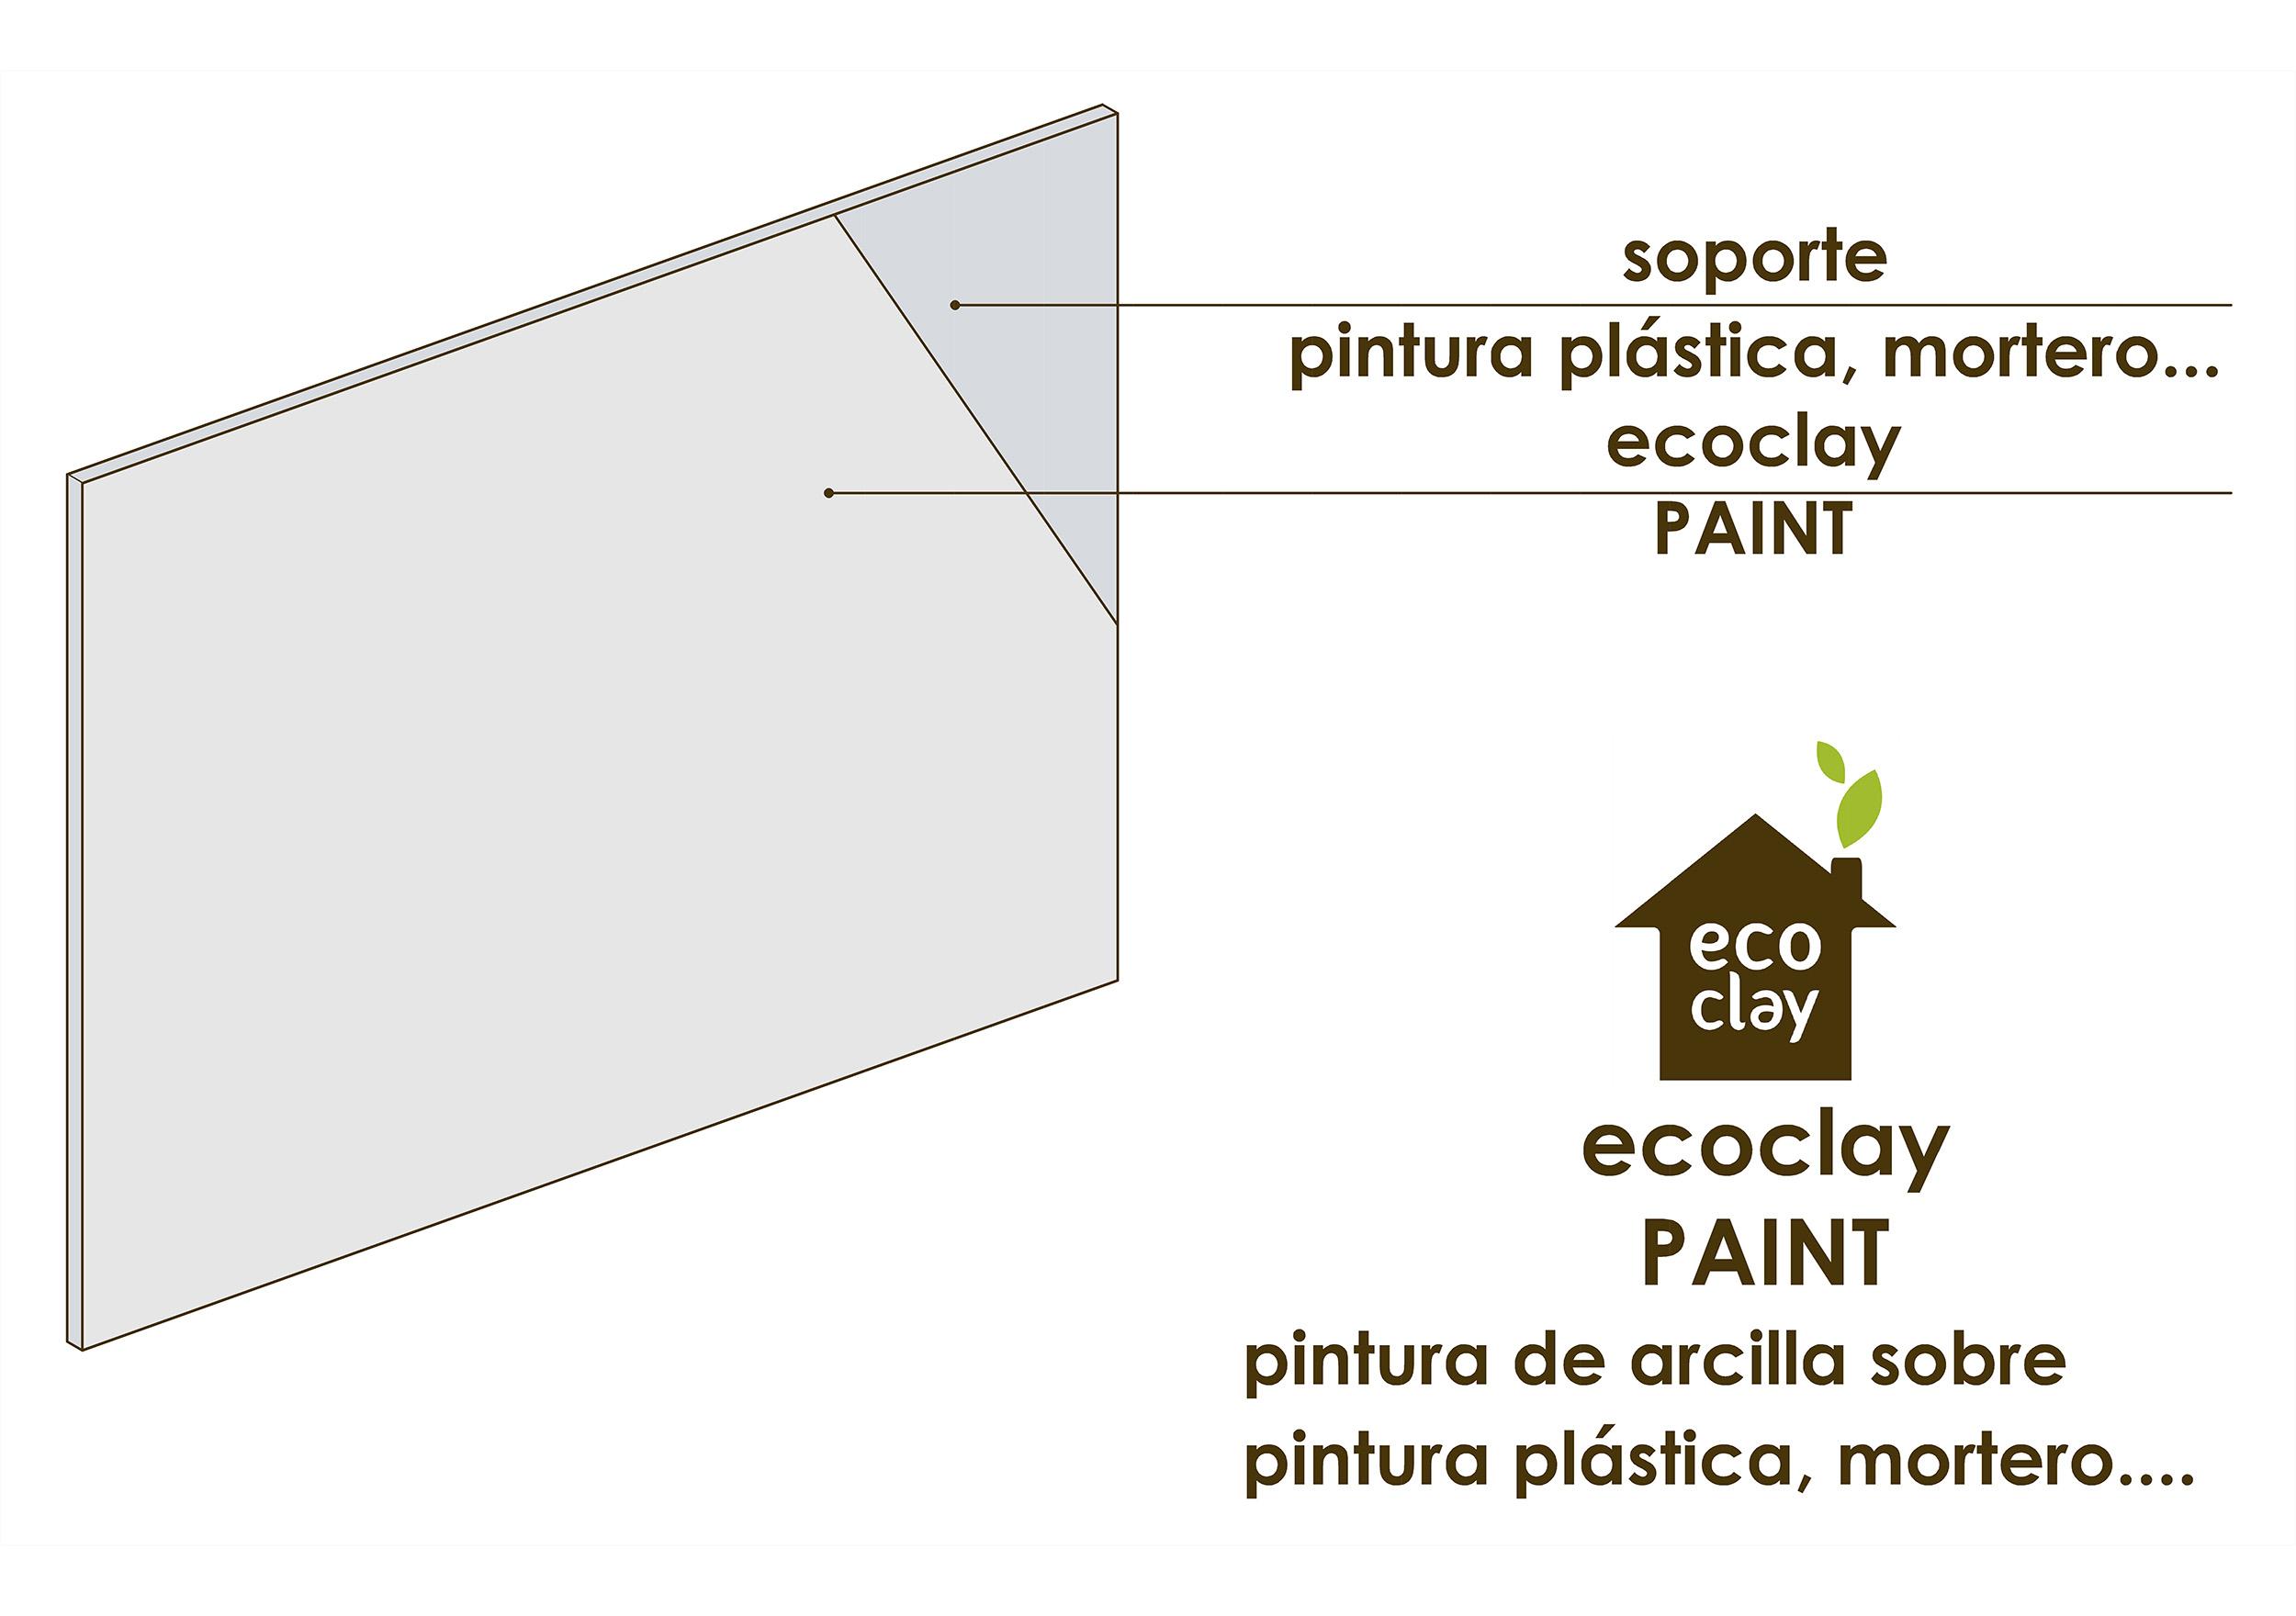 ecoclay PAINT, sobre pintura plástica, mortero..